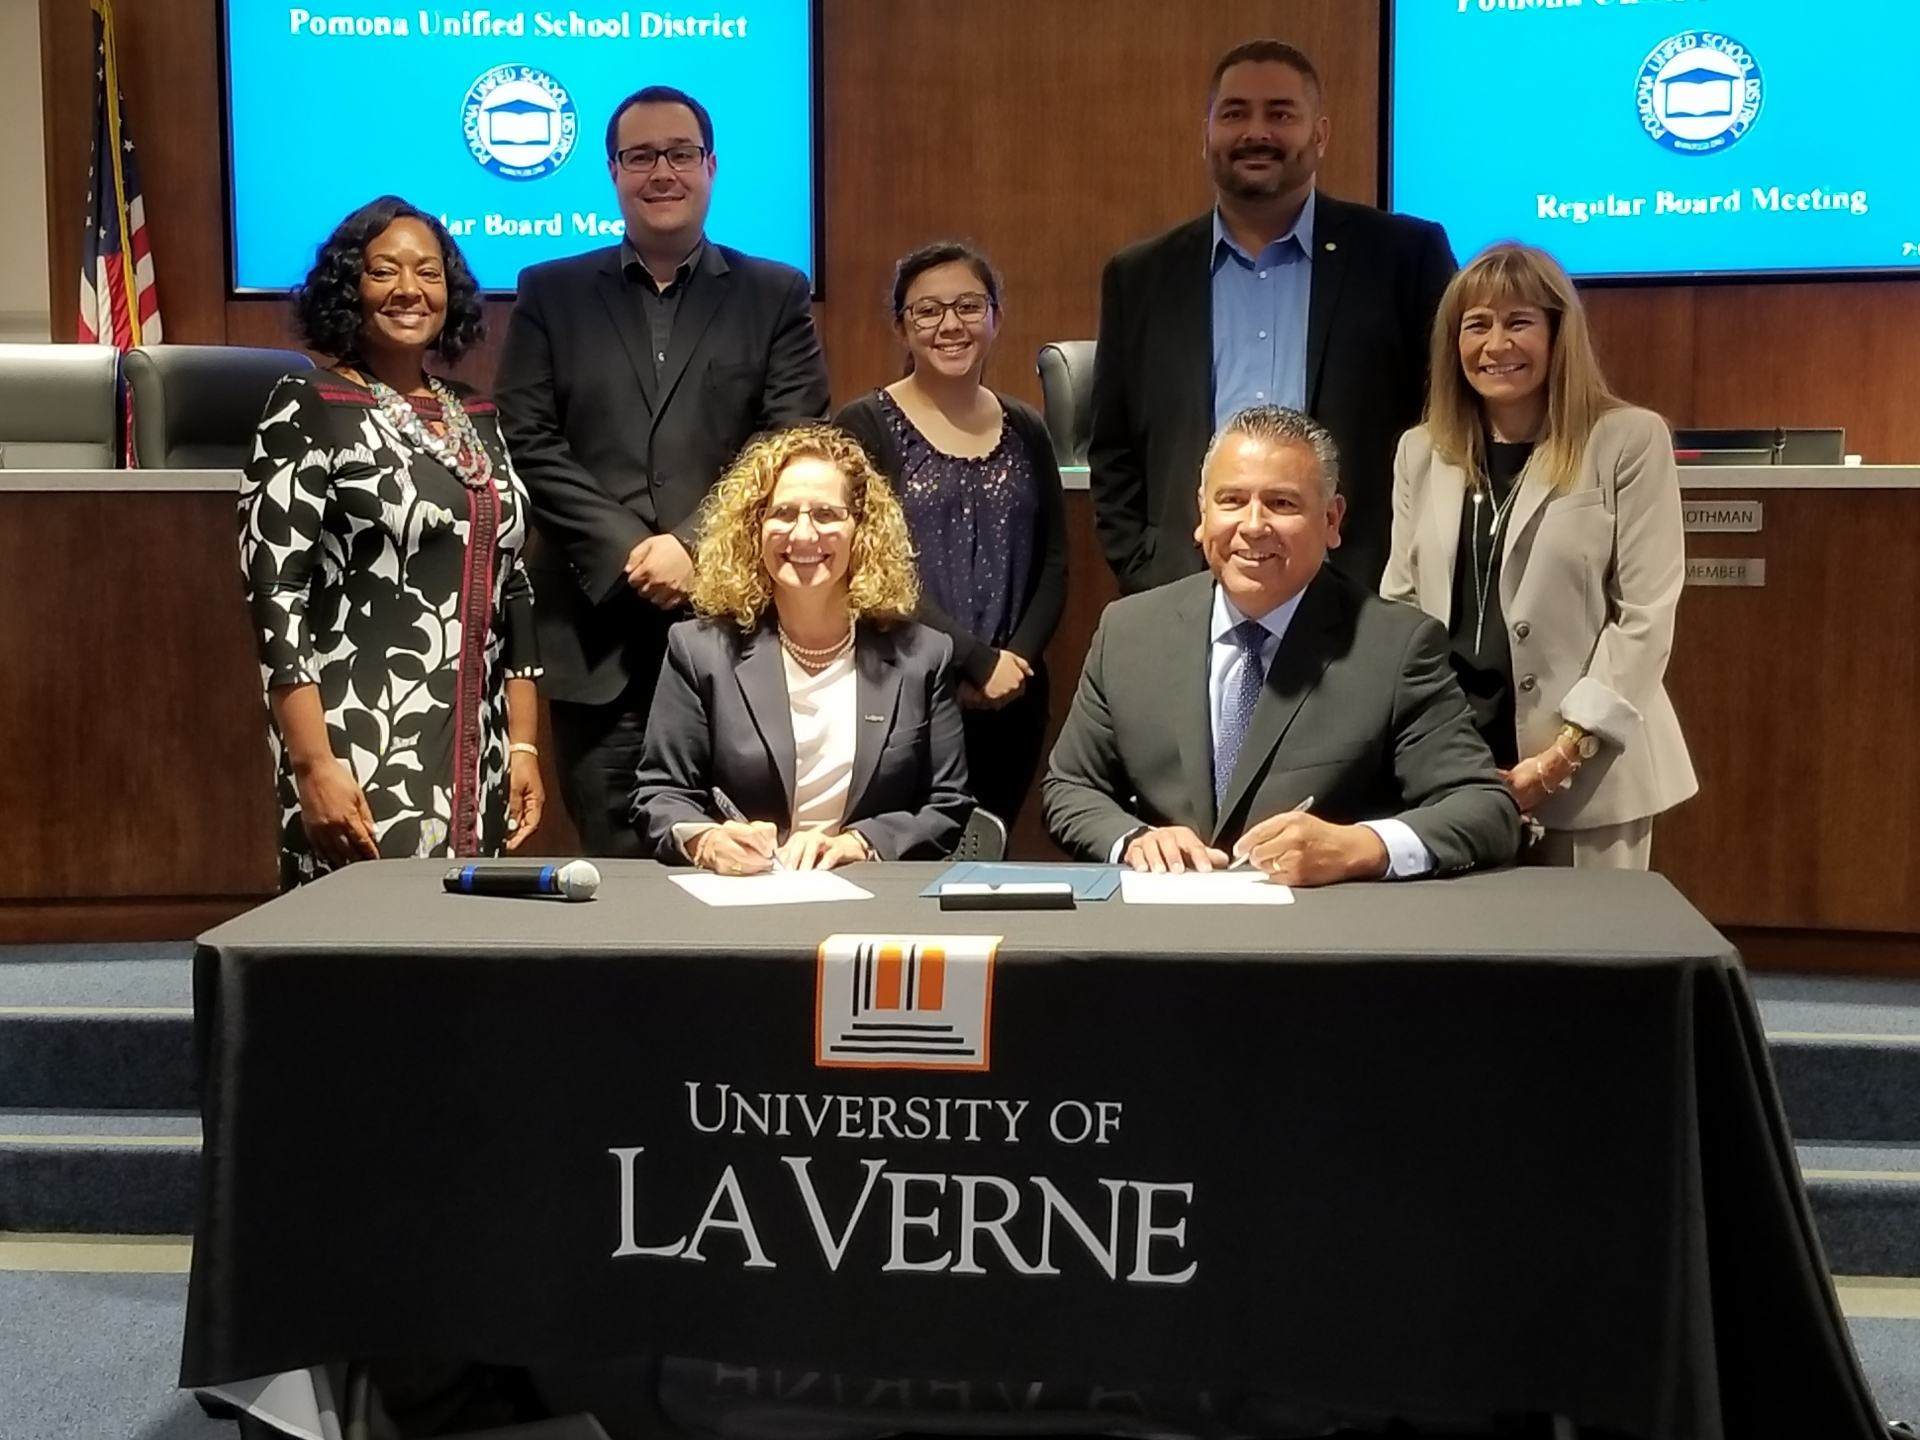 University of La Verne President Devorah Lieberman, Pomona Unified Superintendent Richard Garcia, and members of the Pomona Unified School Board.